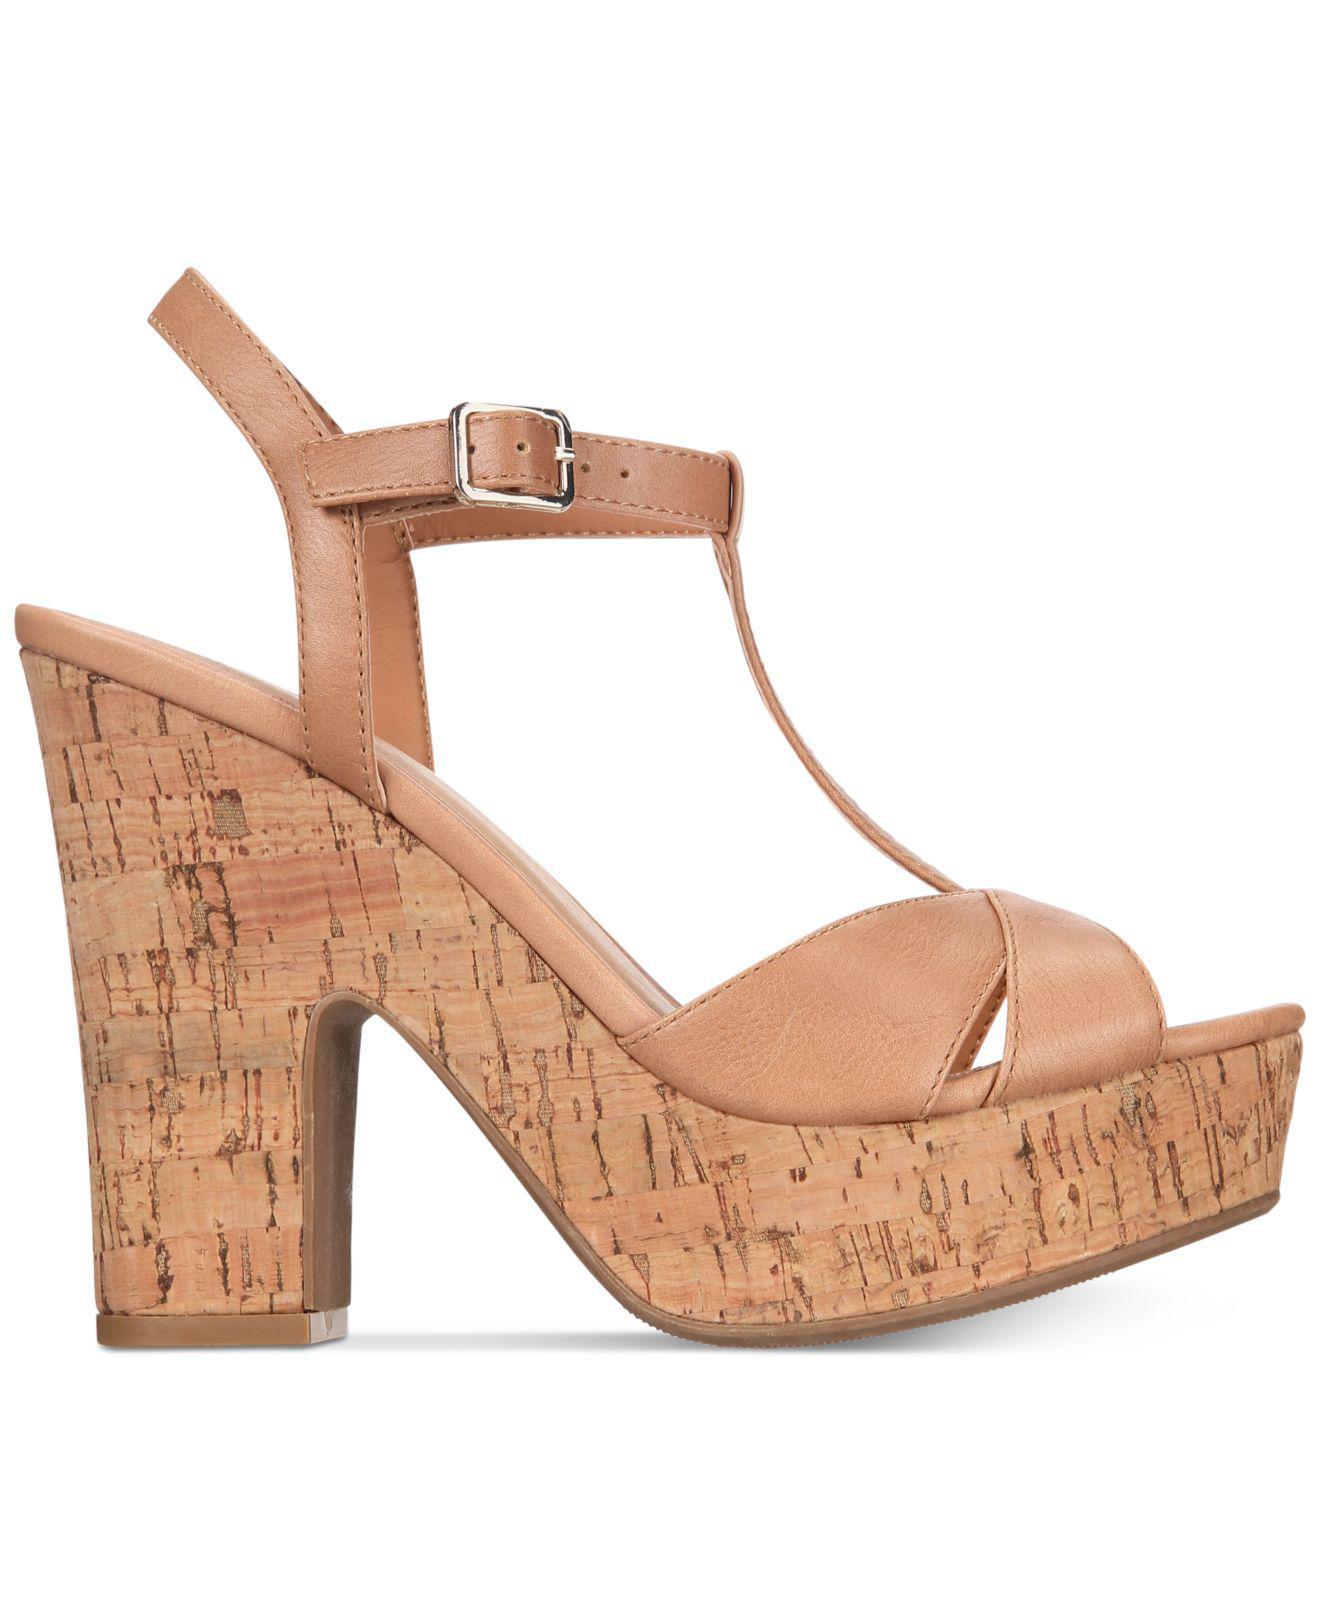 1e9efcb3589d Lyst - American Rag Jamie T-strap Platform Dress Sandals